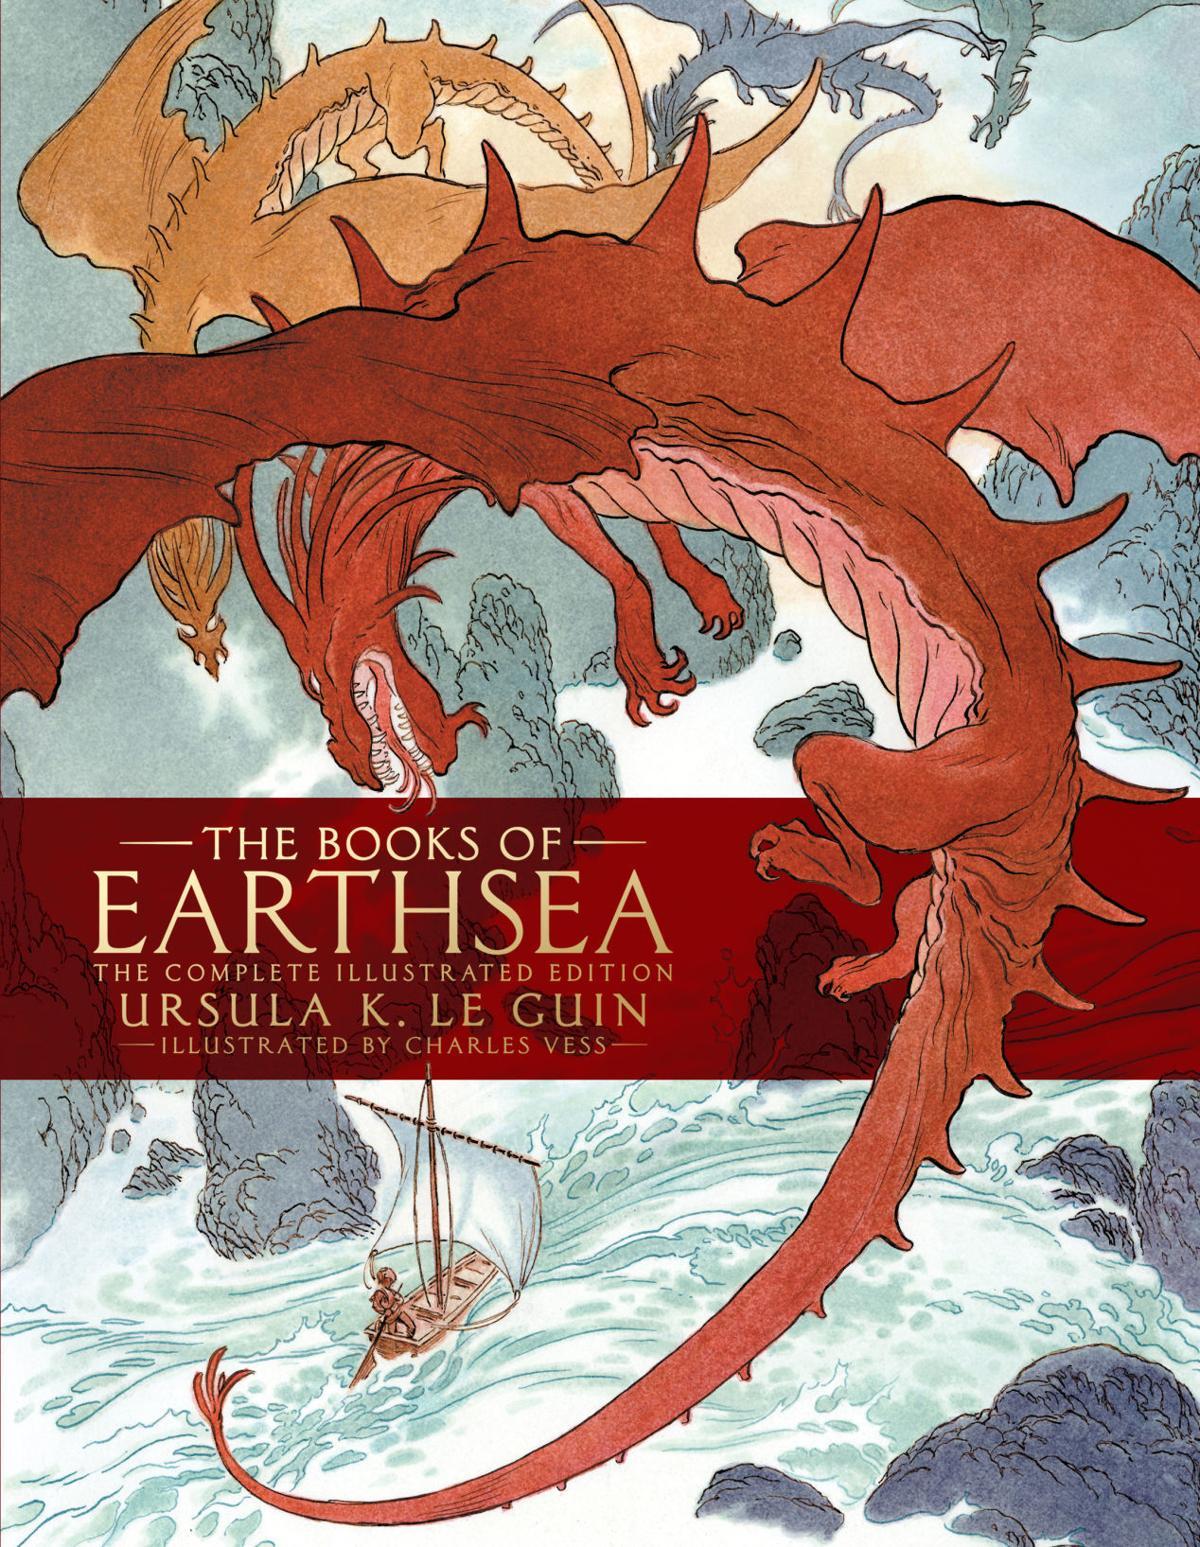 Earthsea cover